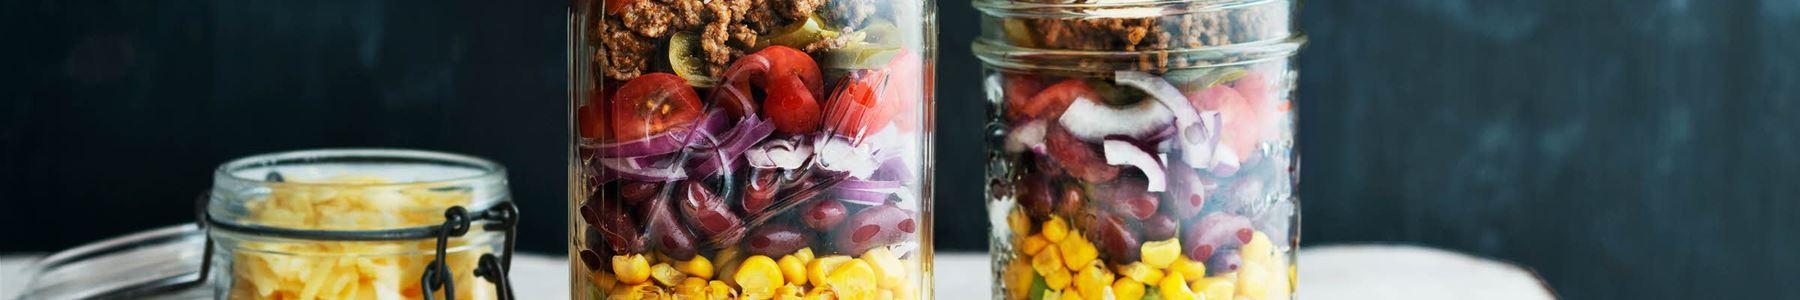 Hurtig + Kidneybønner + Salater